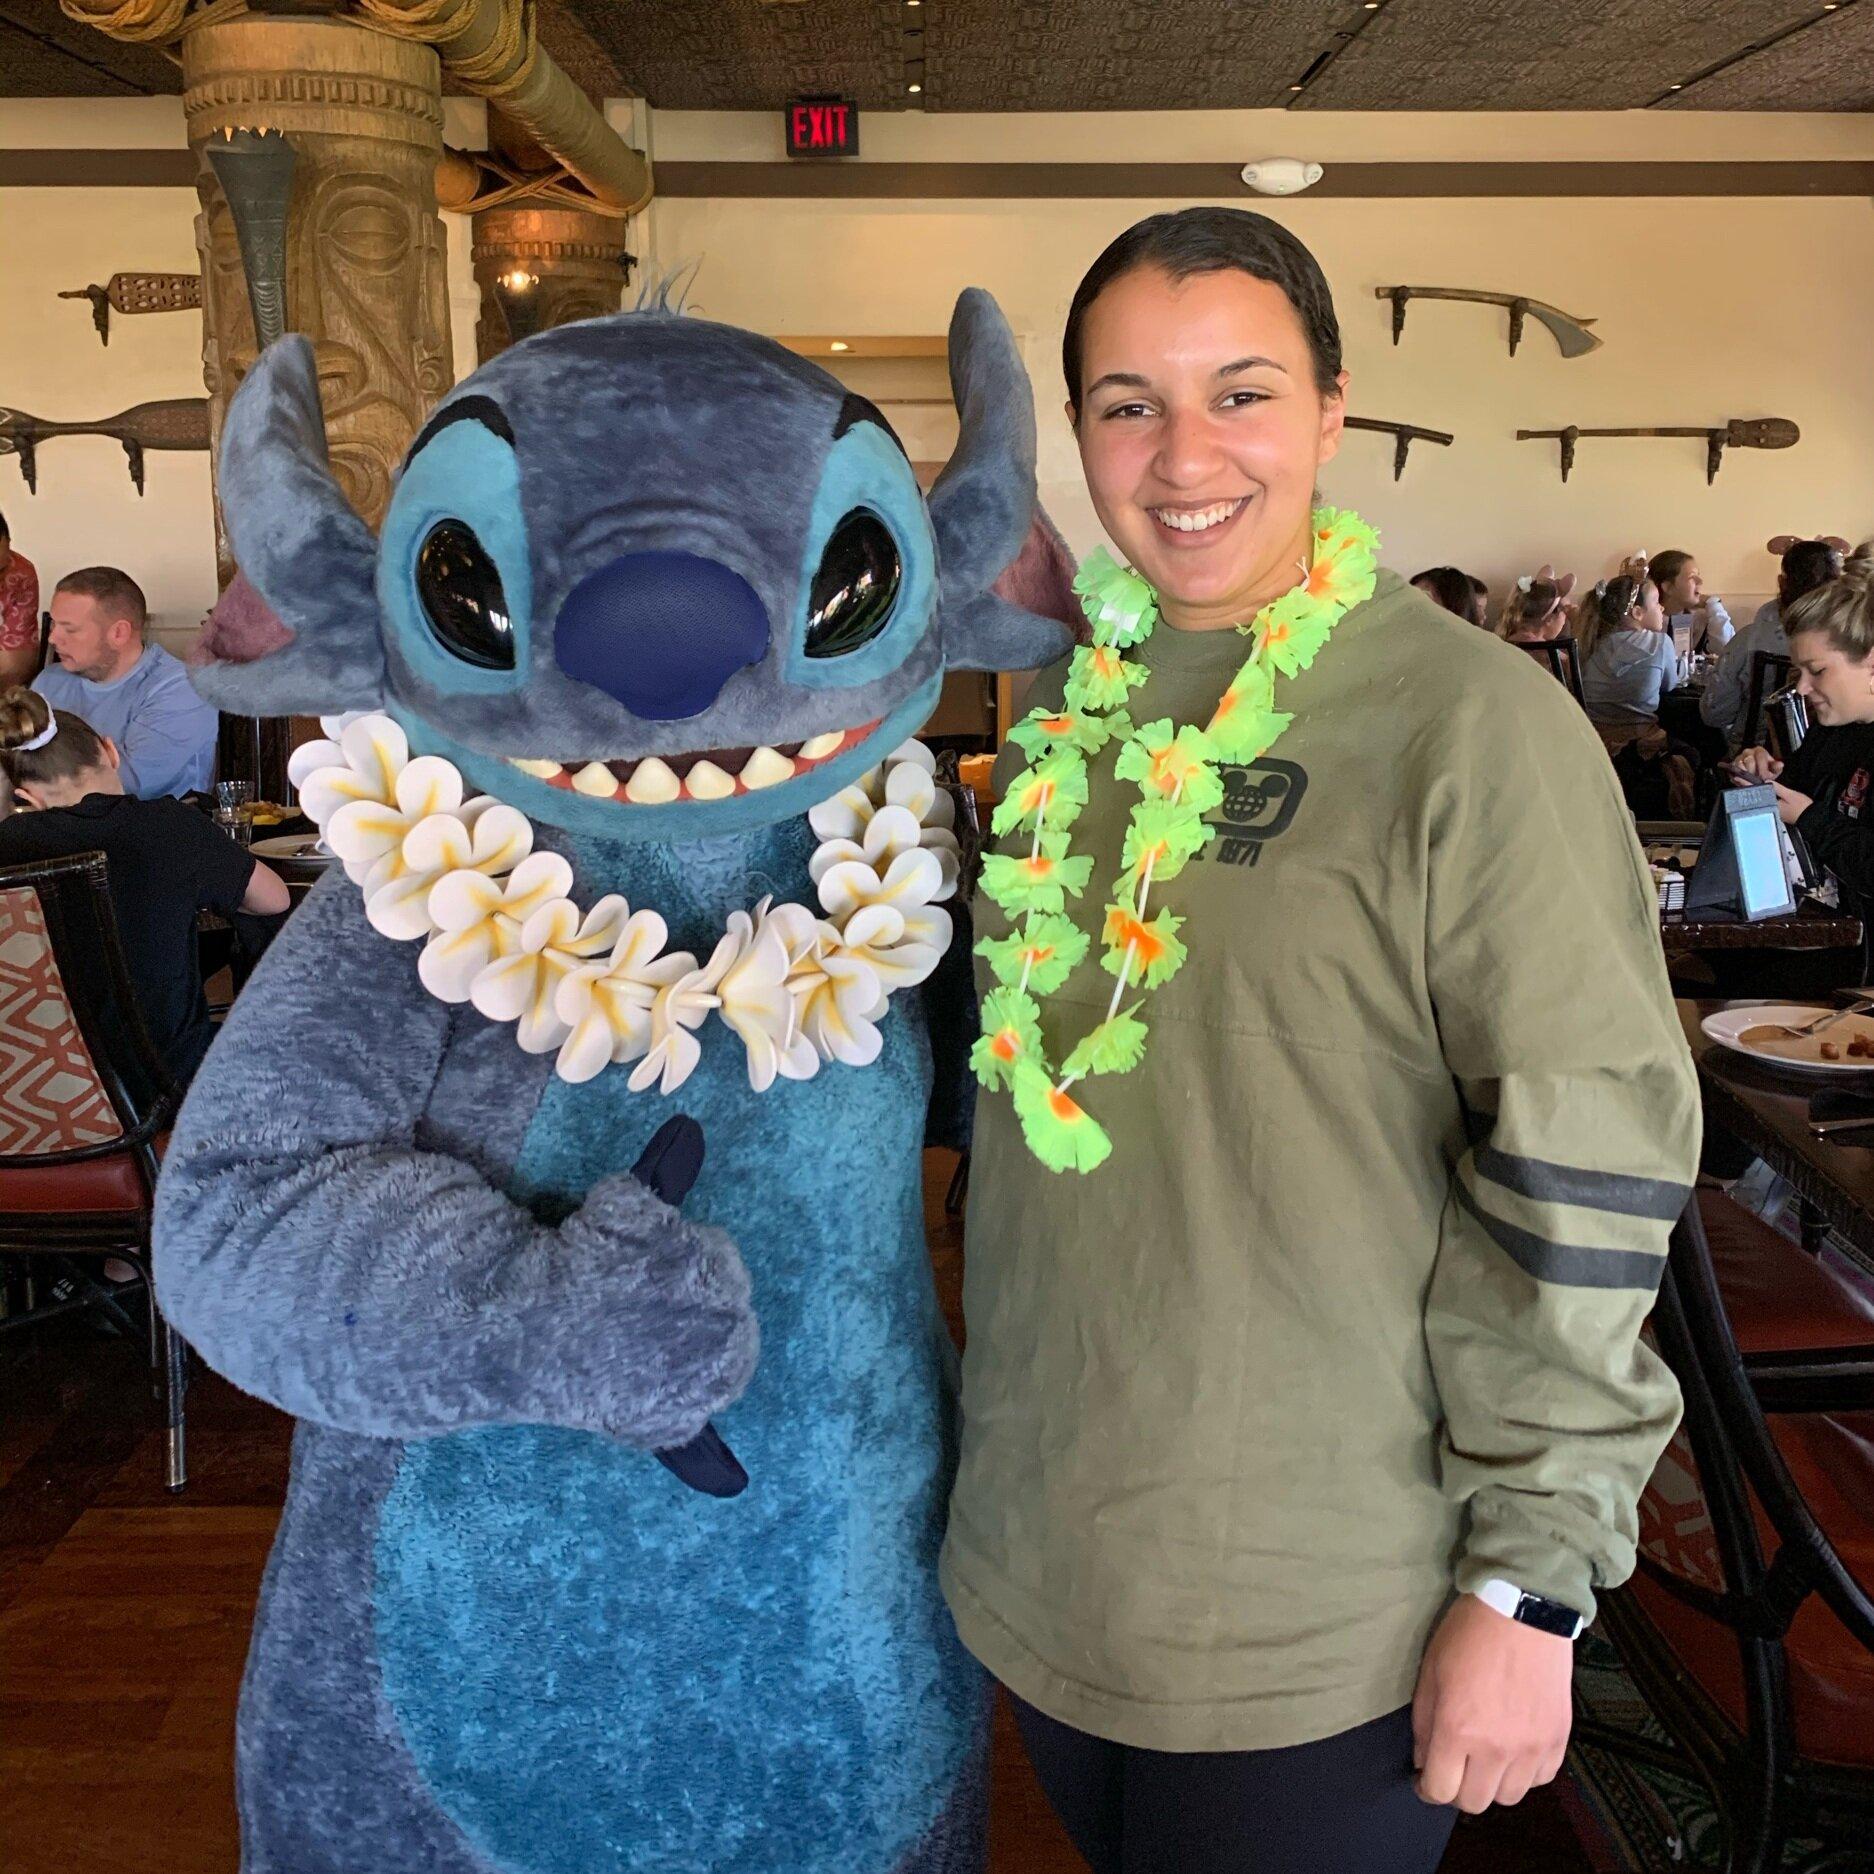 Meeting Stitch at 'Ohana! ('Ohana Best Friends Breakfast)